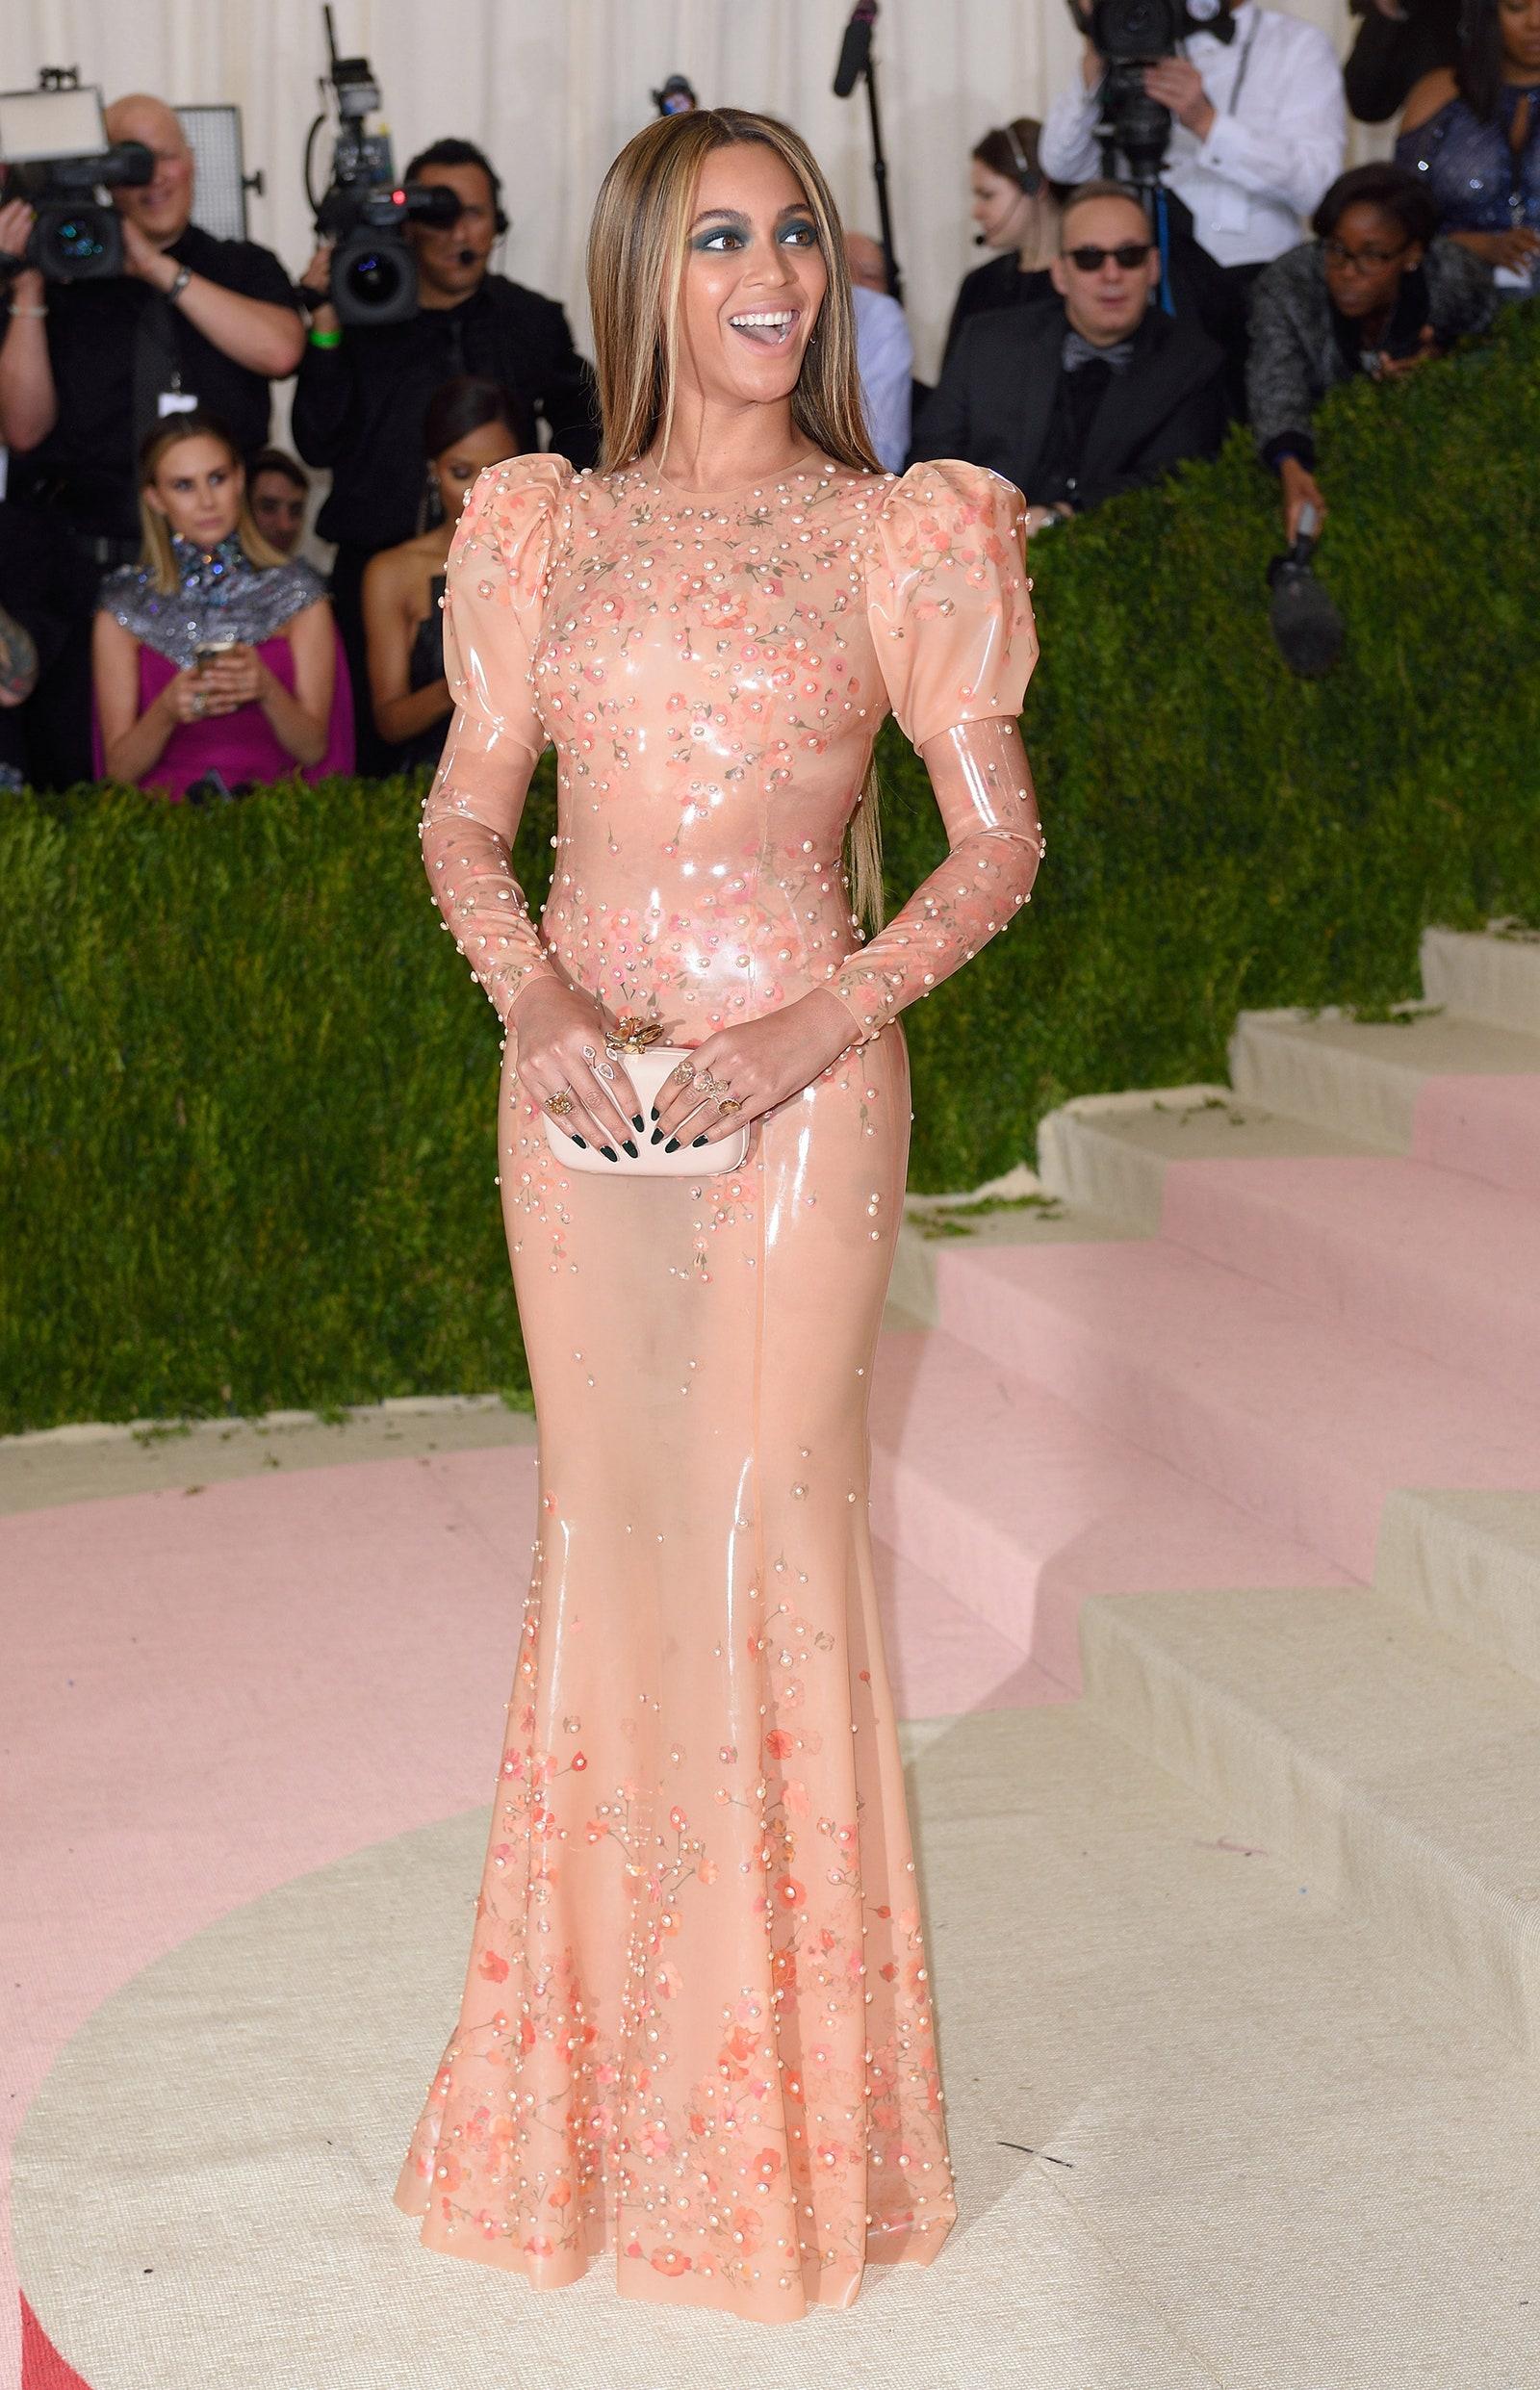 A passzos latex cucc, még mielőtt a Kardashian família hétköznapivá tette volna.<br /><br />BEYONCE<br />Givenchy Couture, 2016